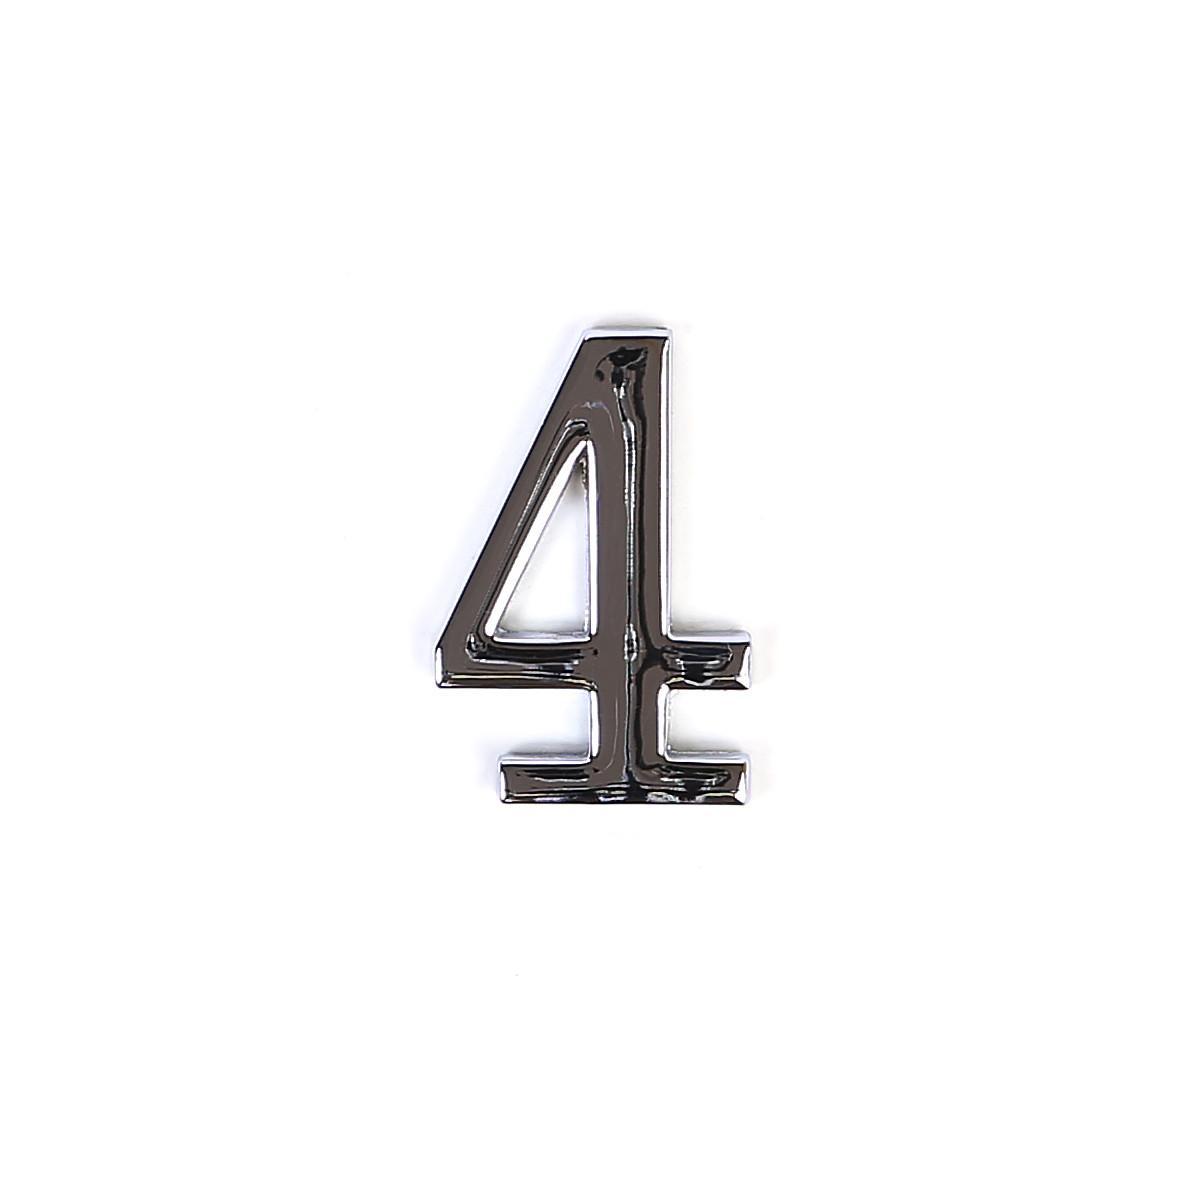 Номер на дверь из цинка Larvij цифра 4 Хром (LNZ4 CP #4)